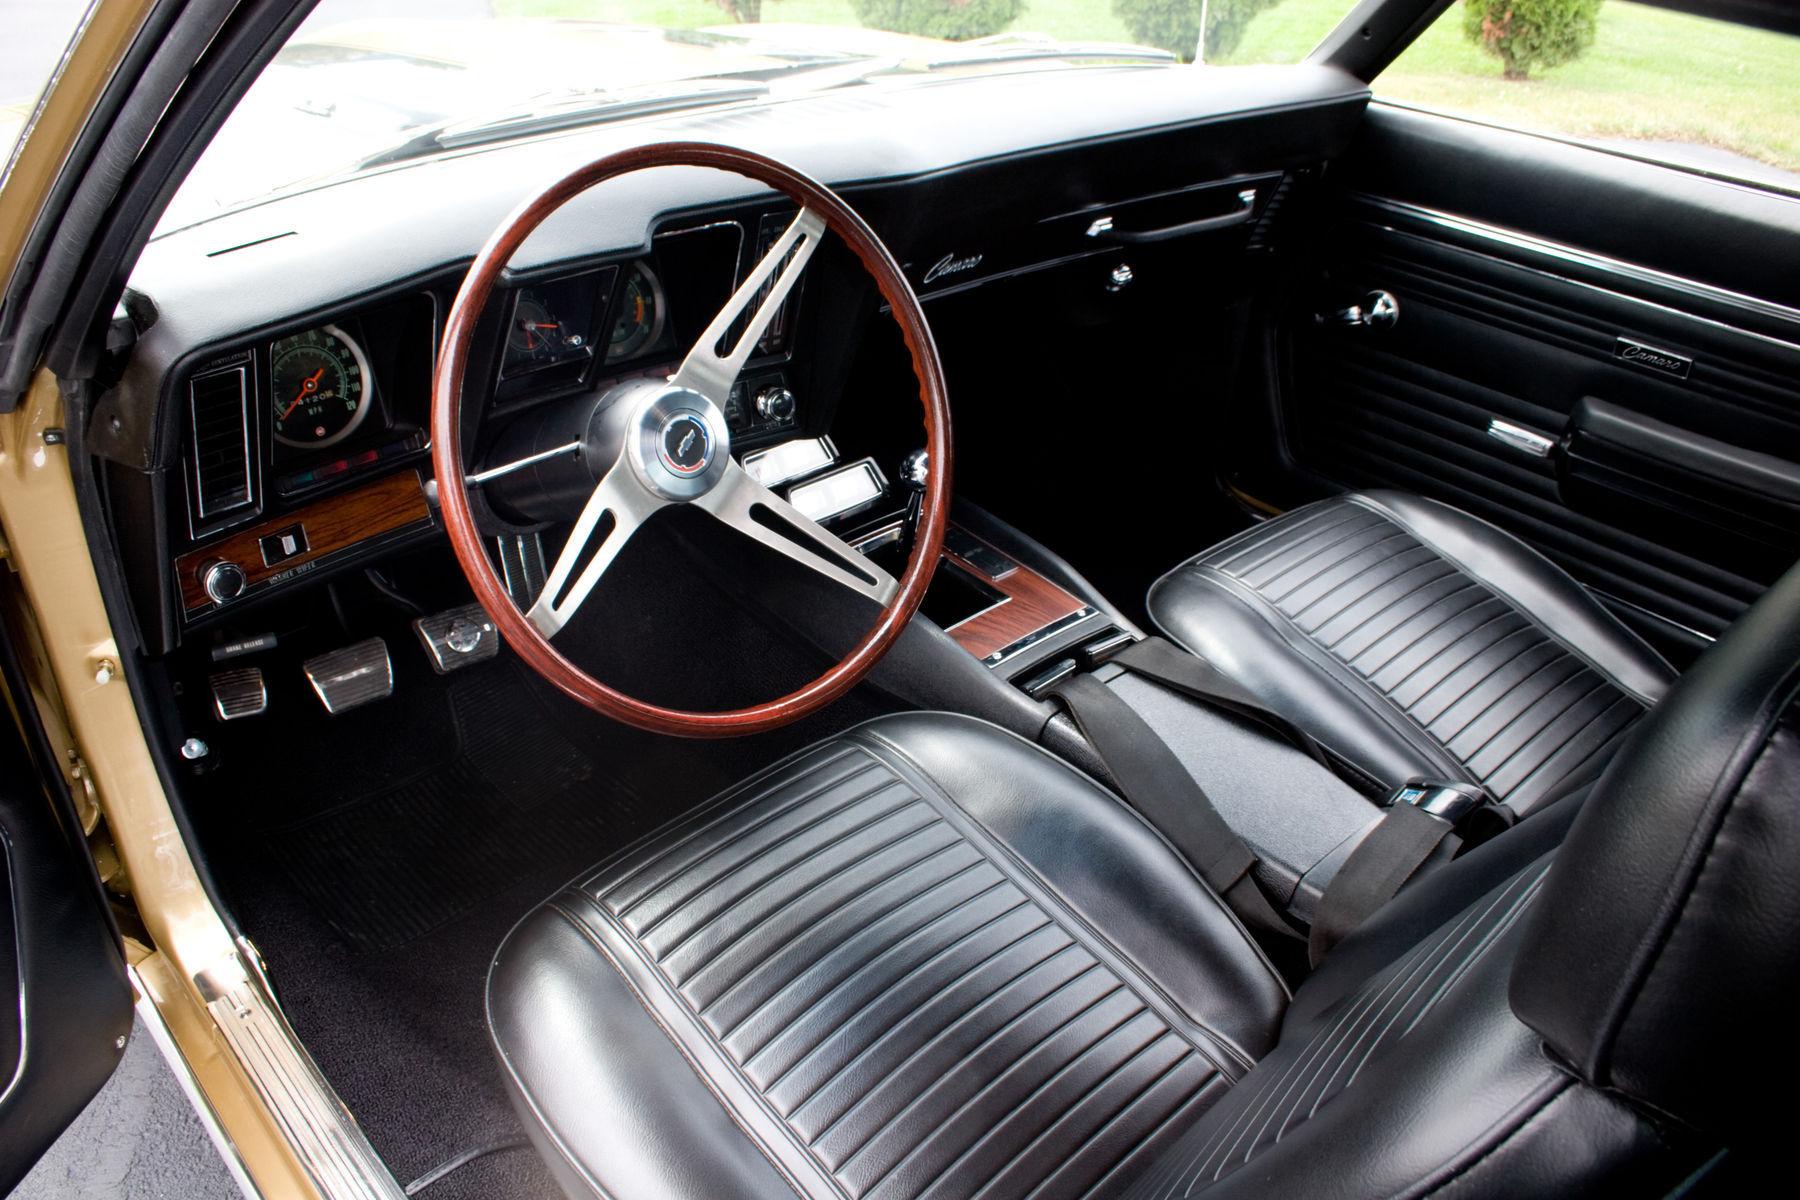 1969 Chevrolet Camaro | 1969 Camaro Z/28 Crossram 302